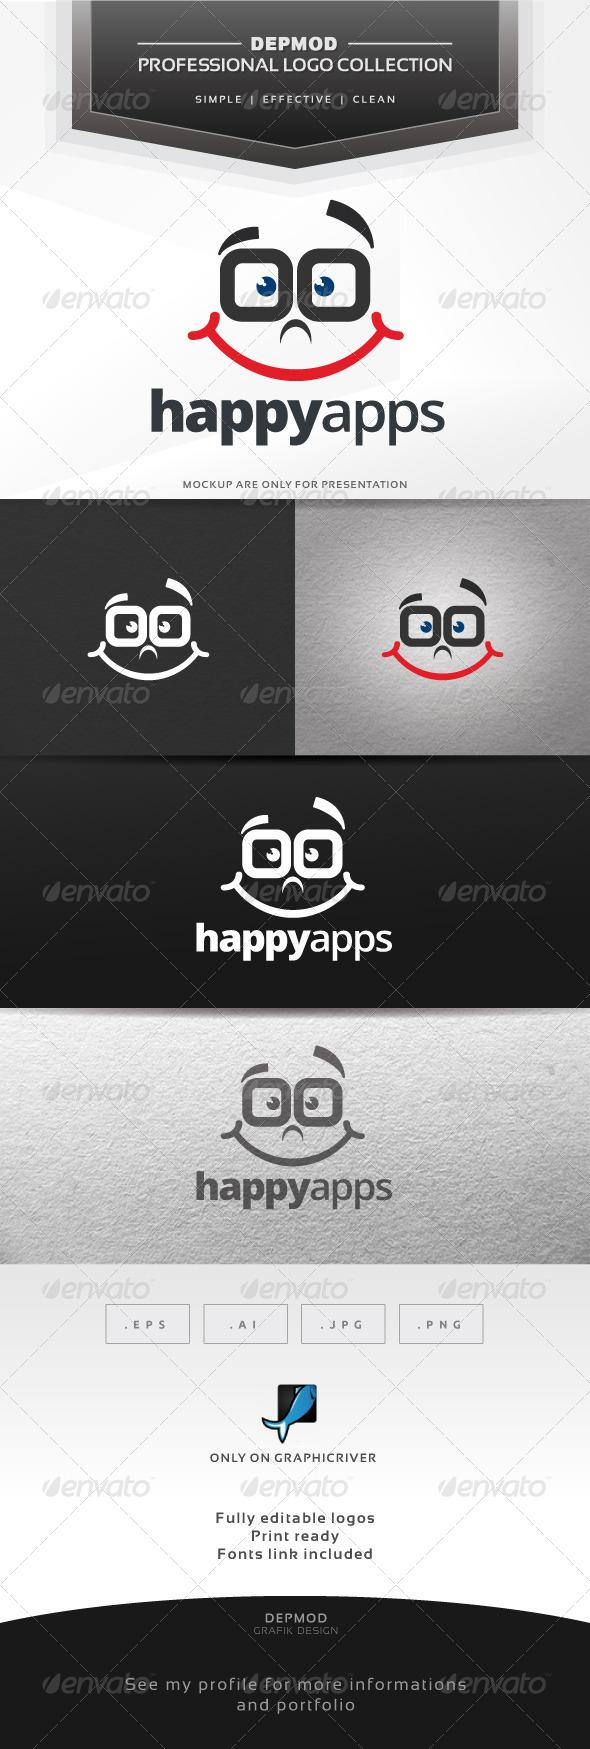 GraphicRiver Happy Apps Logo 6680762